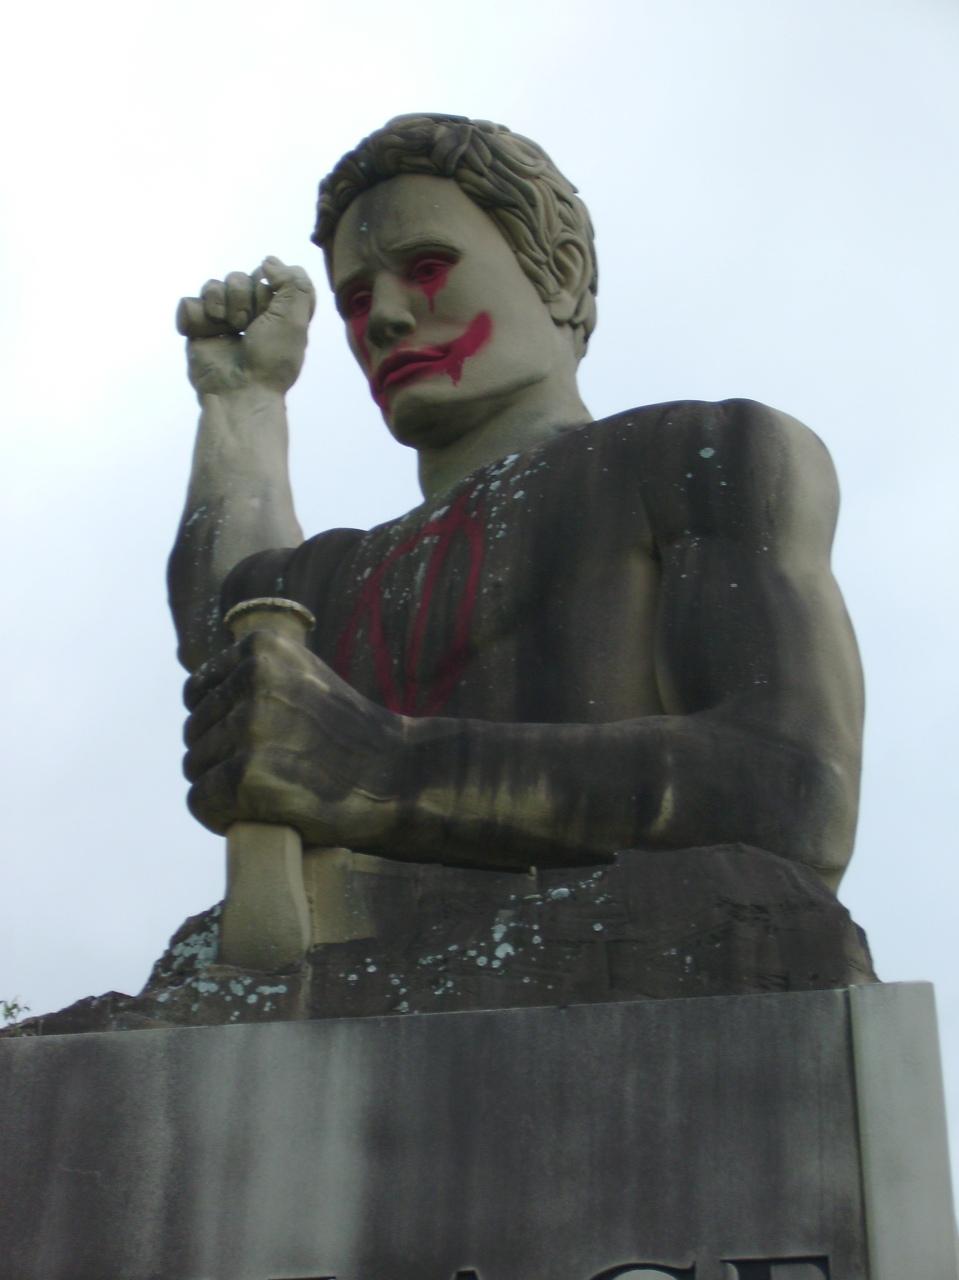 V for Vendetta statue